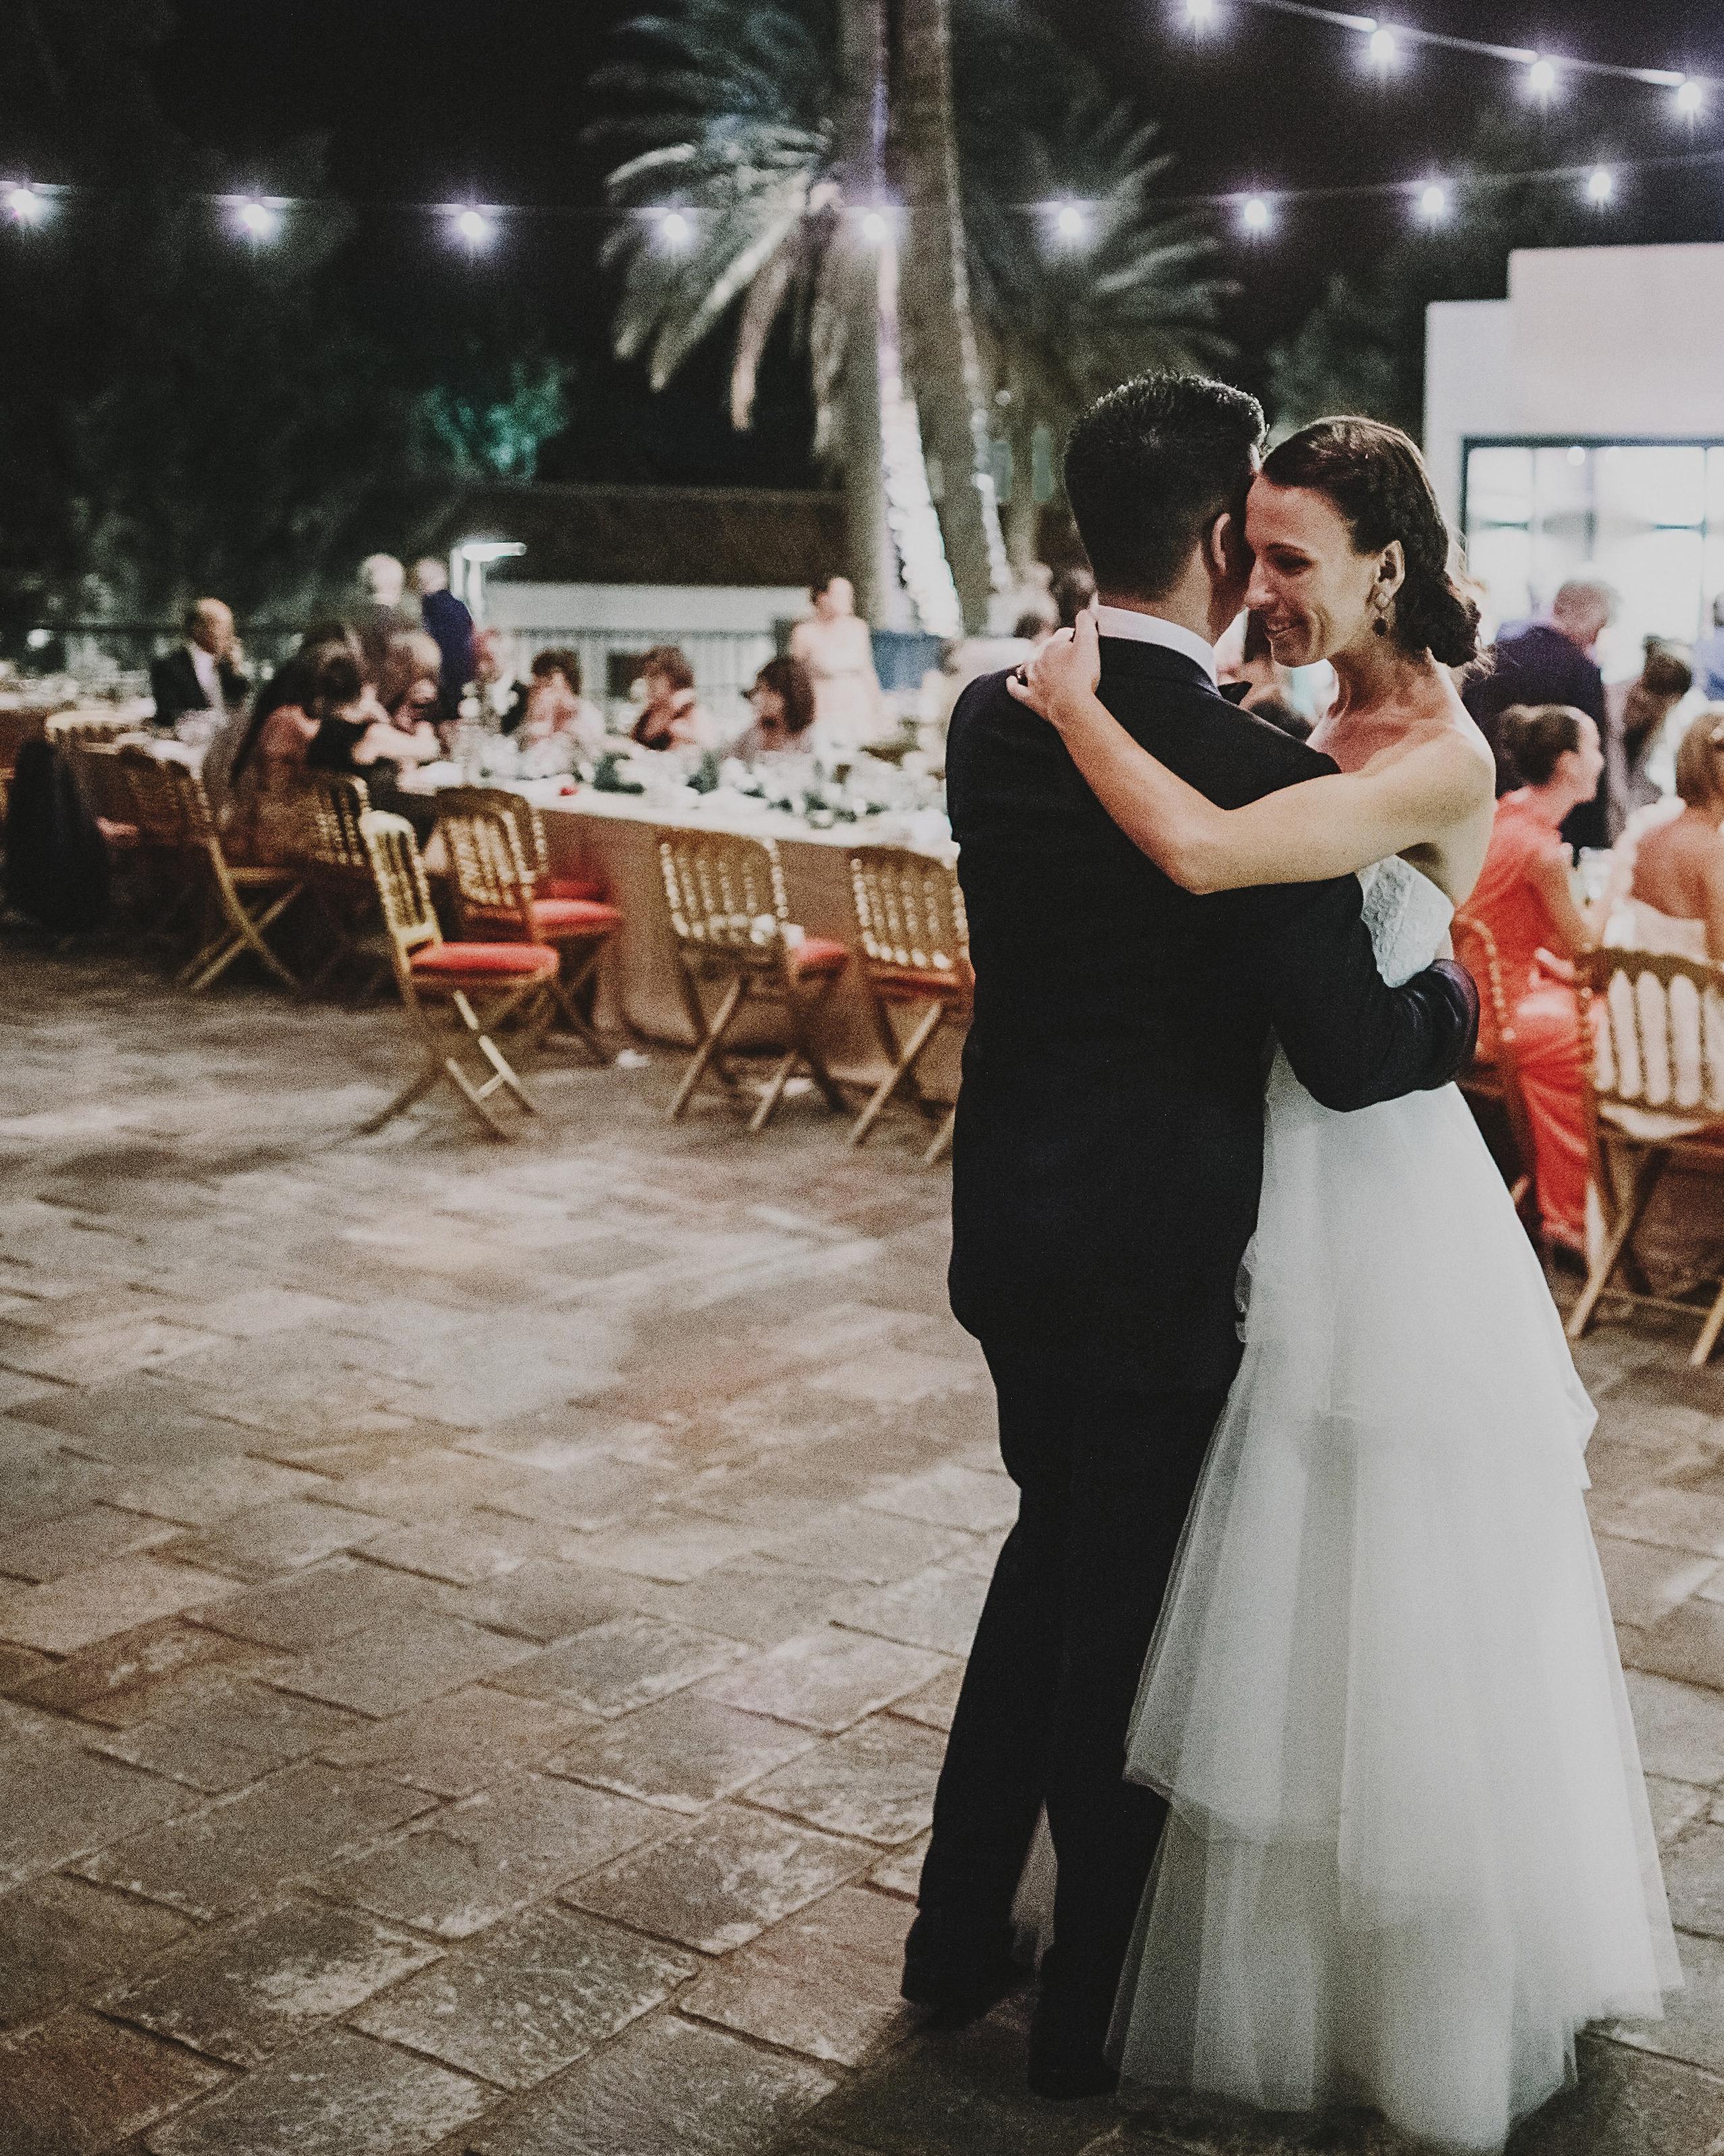 tamara-brett-wedding-firstdance-1608-s112120-0915.jpg